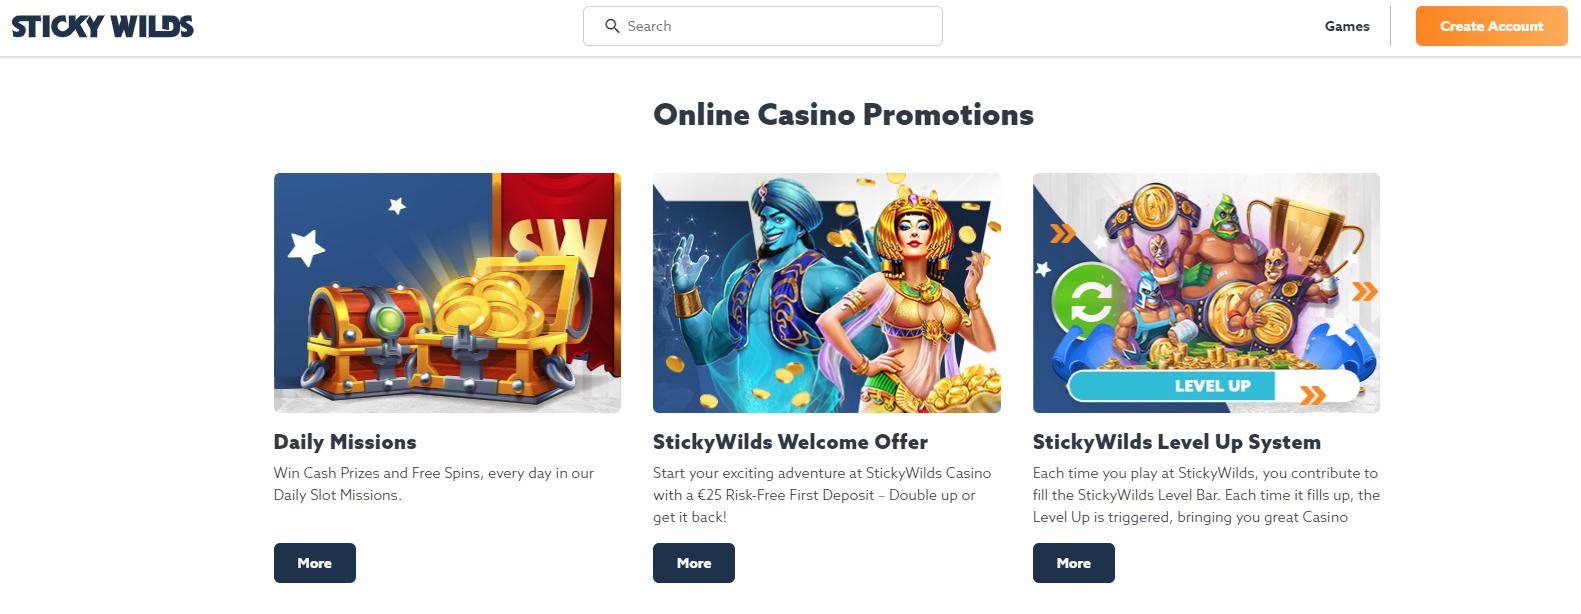 stickywilds_promotions_en